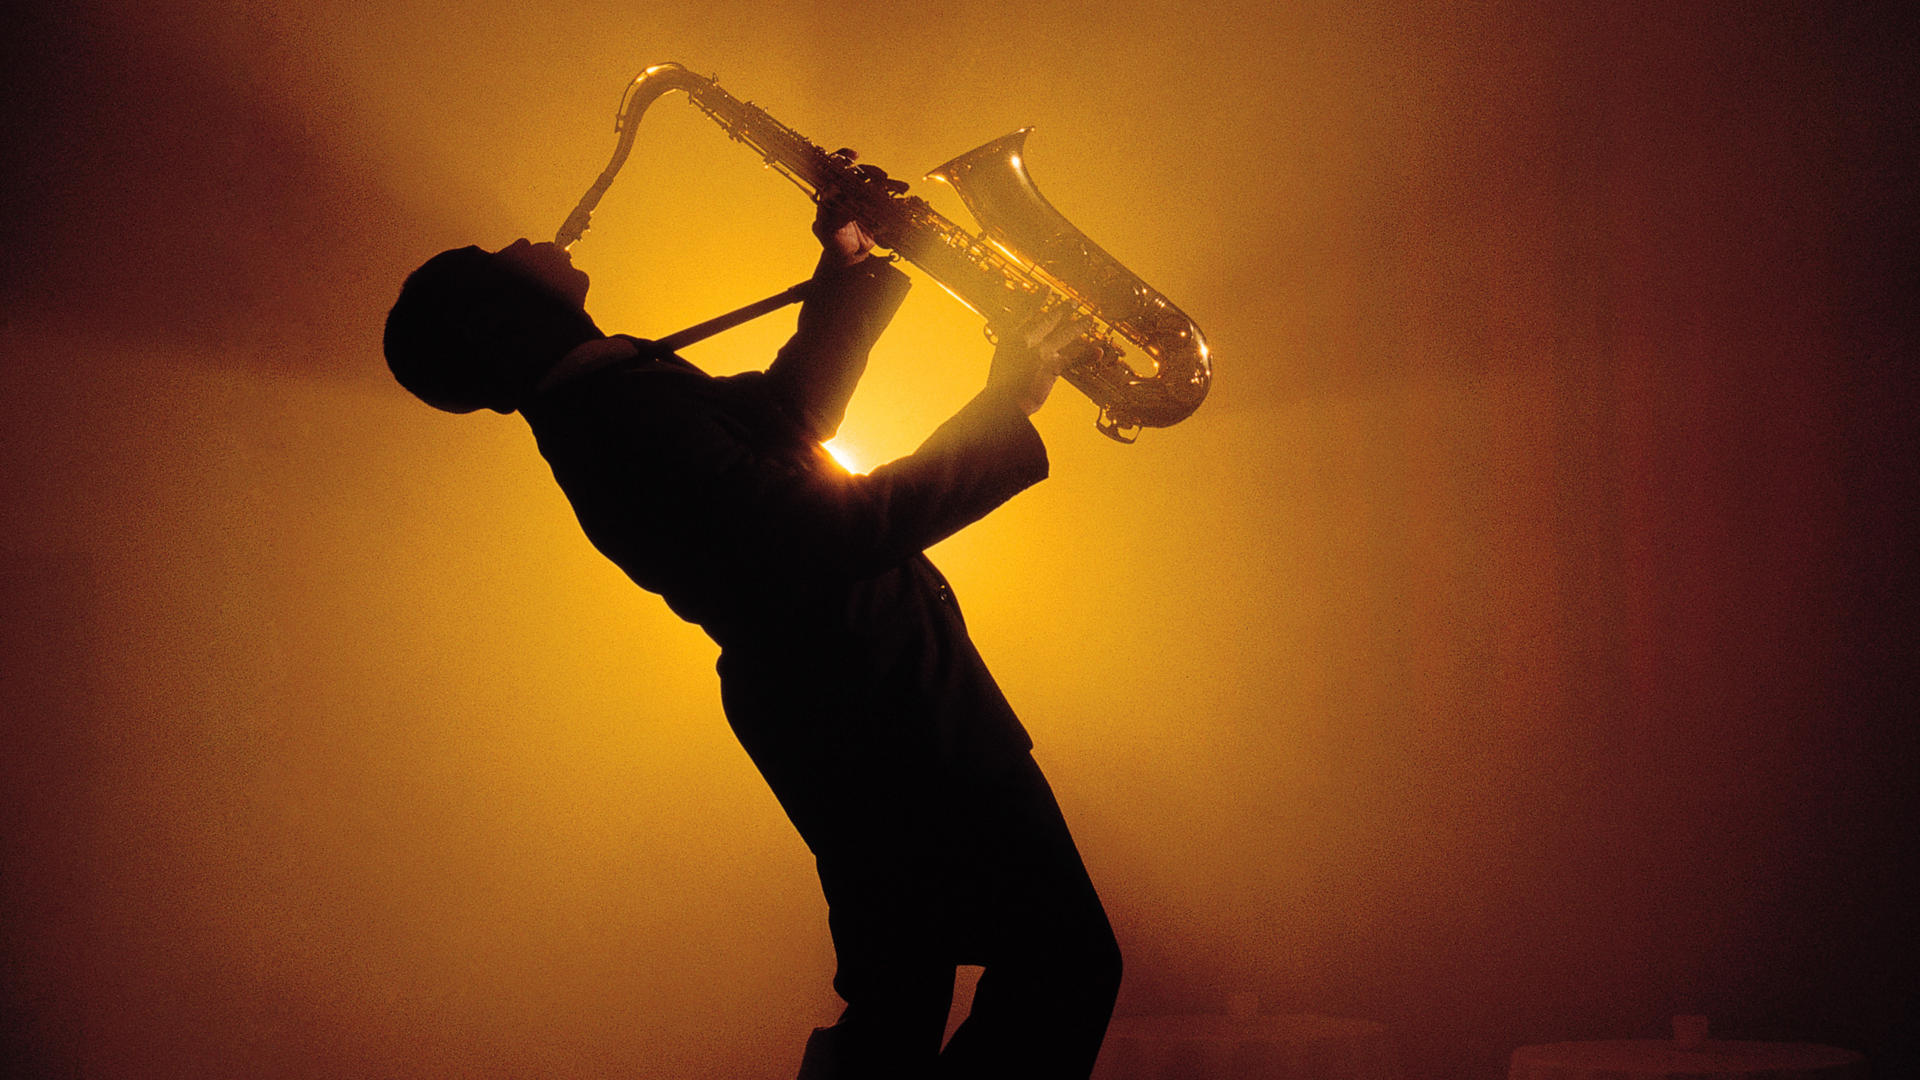 general saxophone love jazz music wallpaper 1920x1080 hot hd 1920x1080